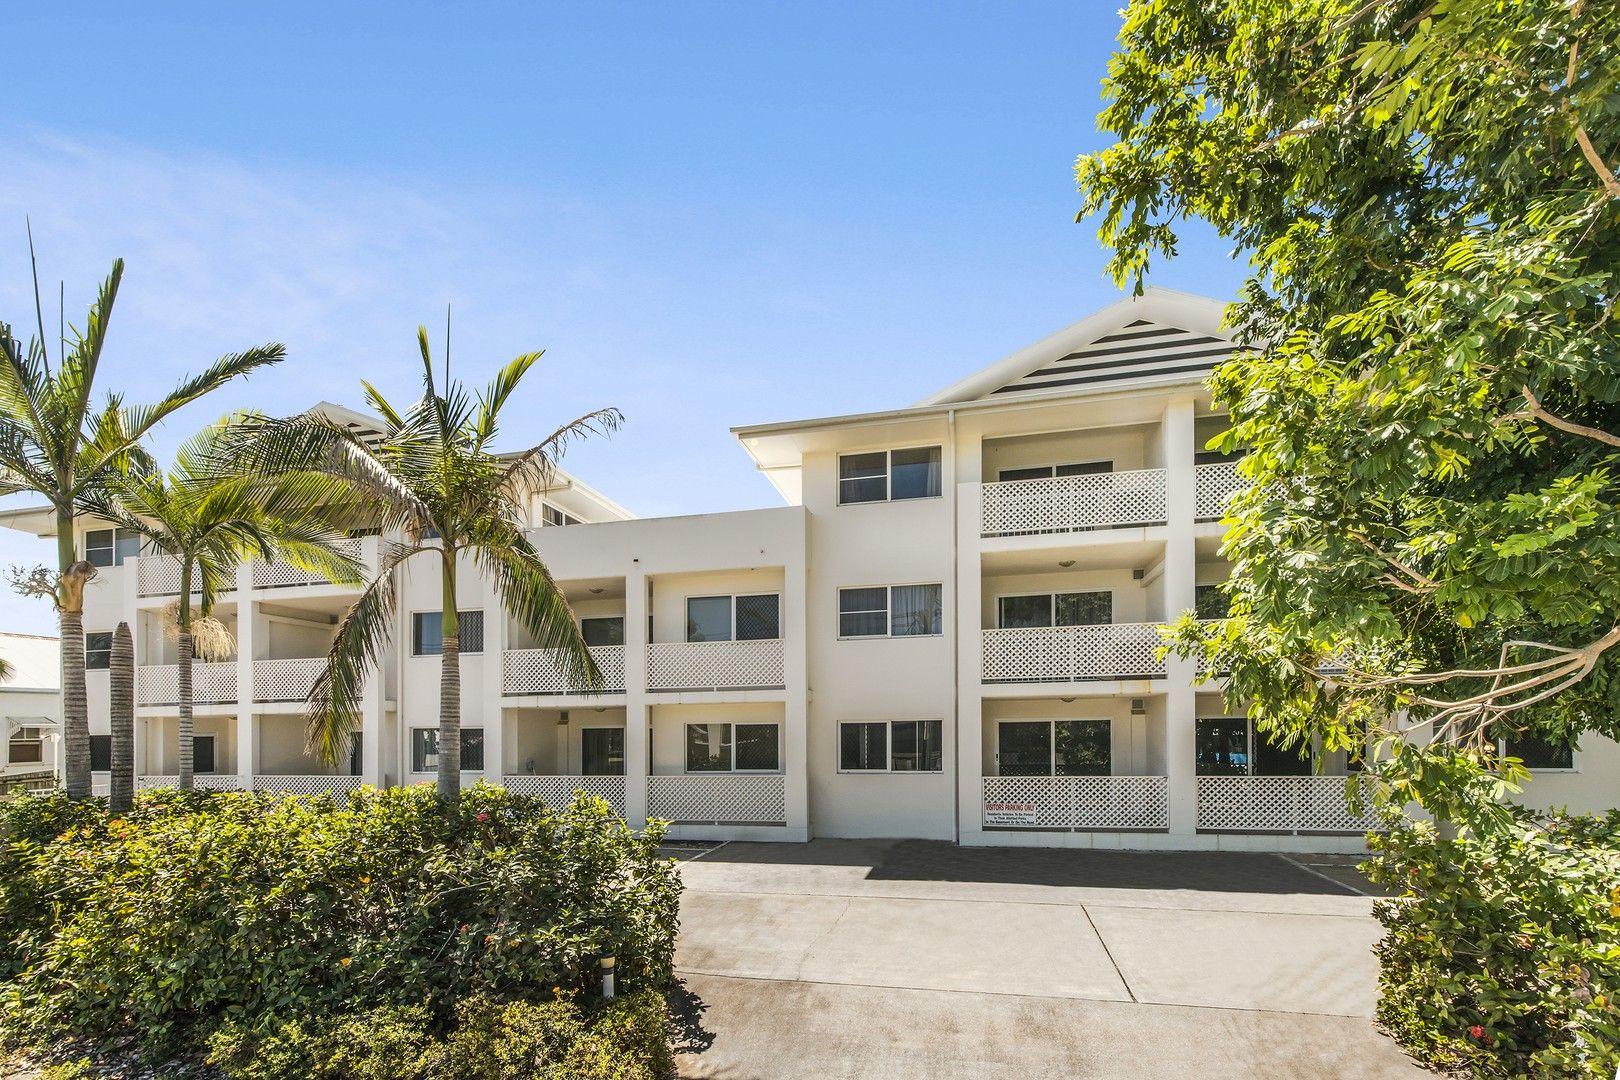 2/51-61 Harold Street, West End QLD 4810, Image 0